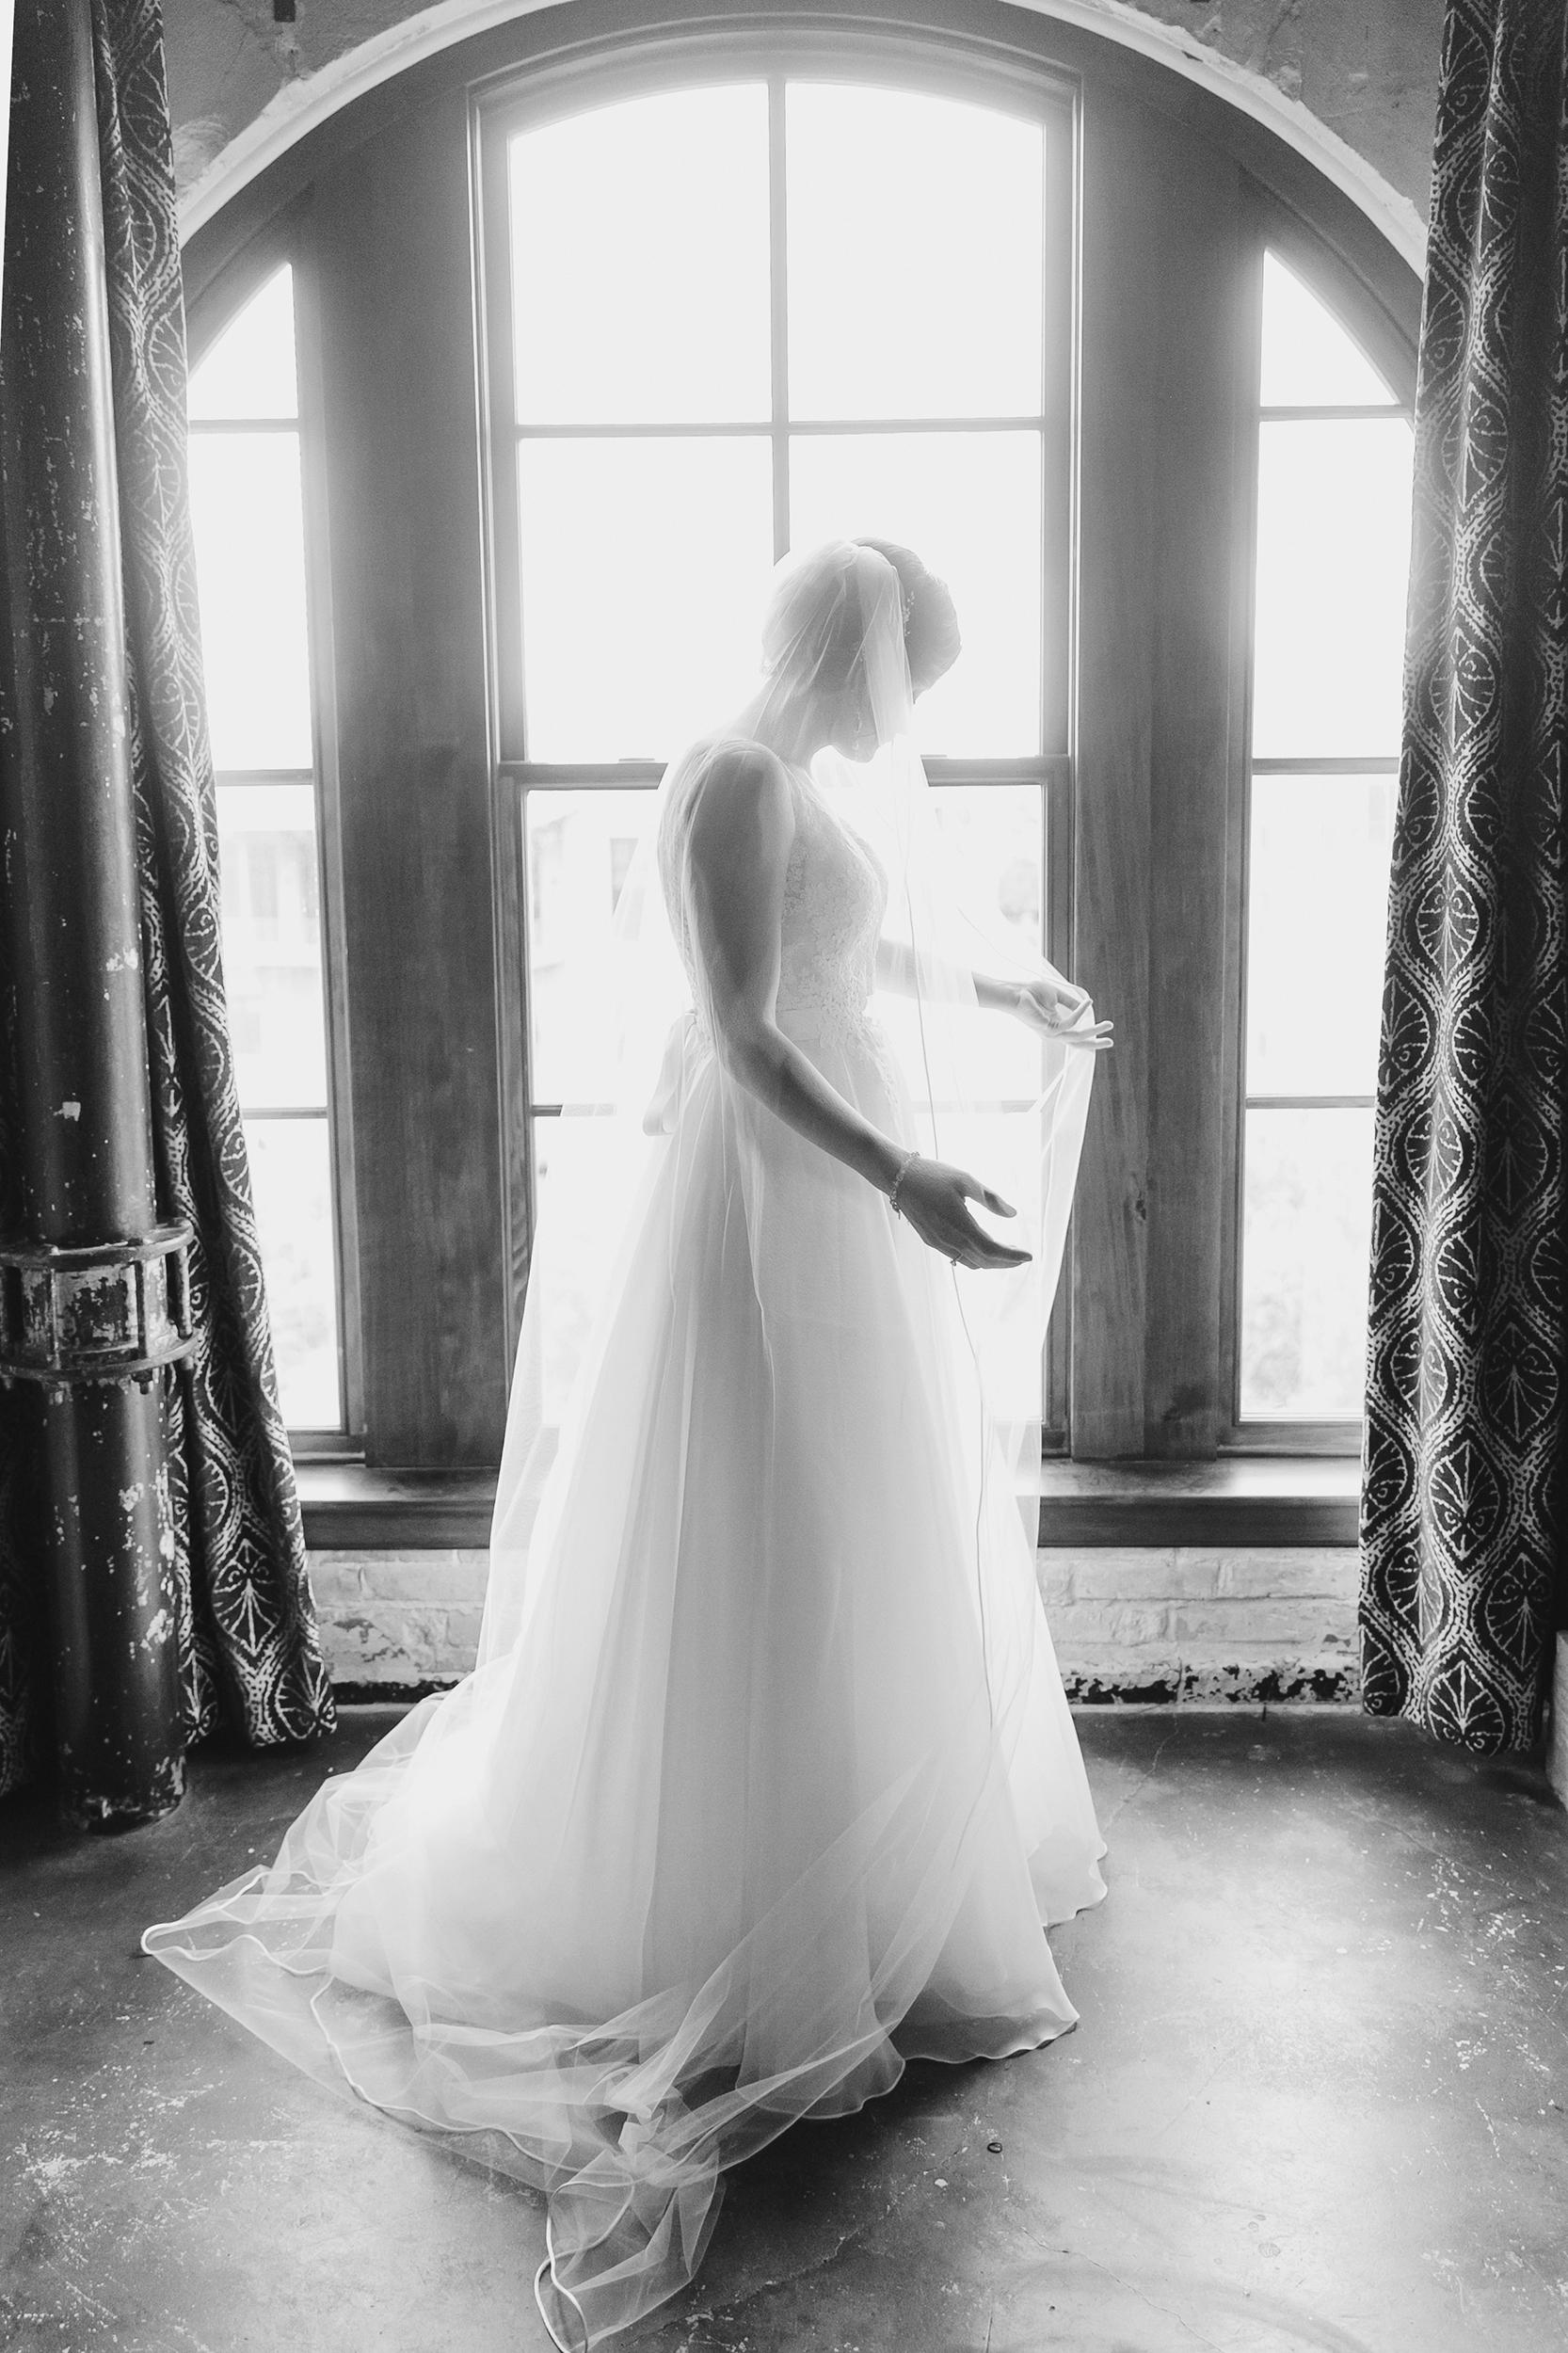 Austin_Wedding_Photographer_Kimberly_Brooke_Photographic_086.jpg